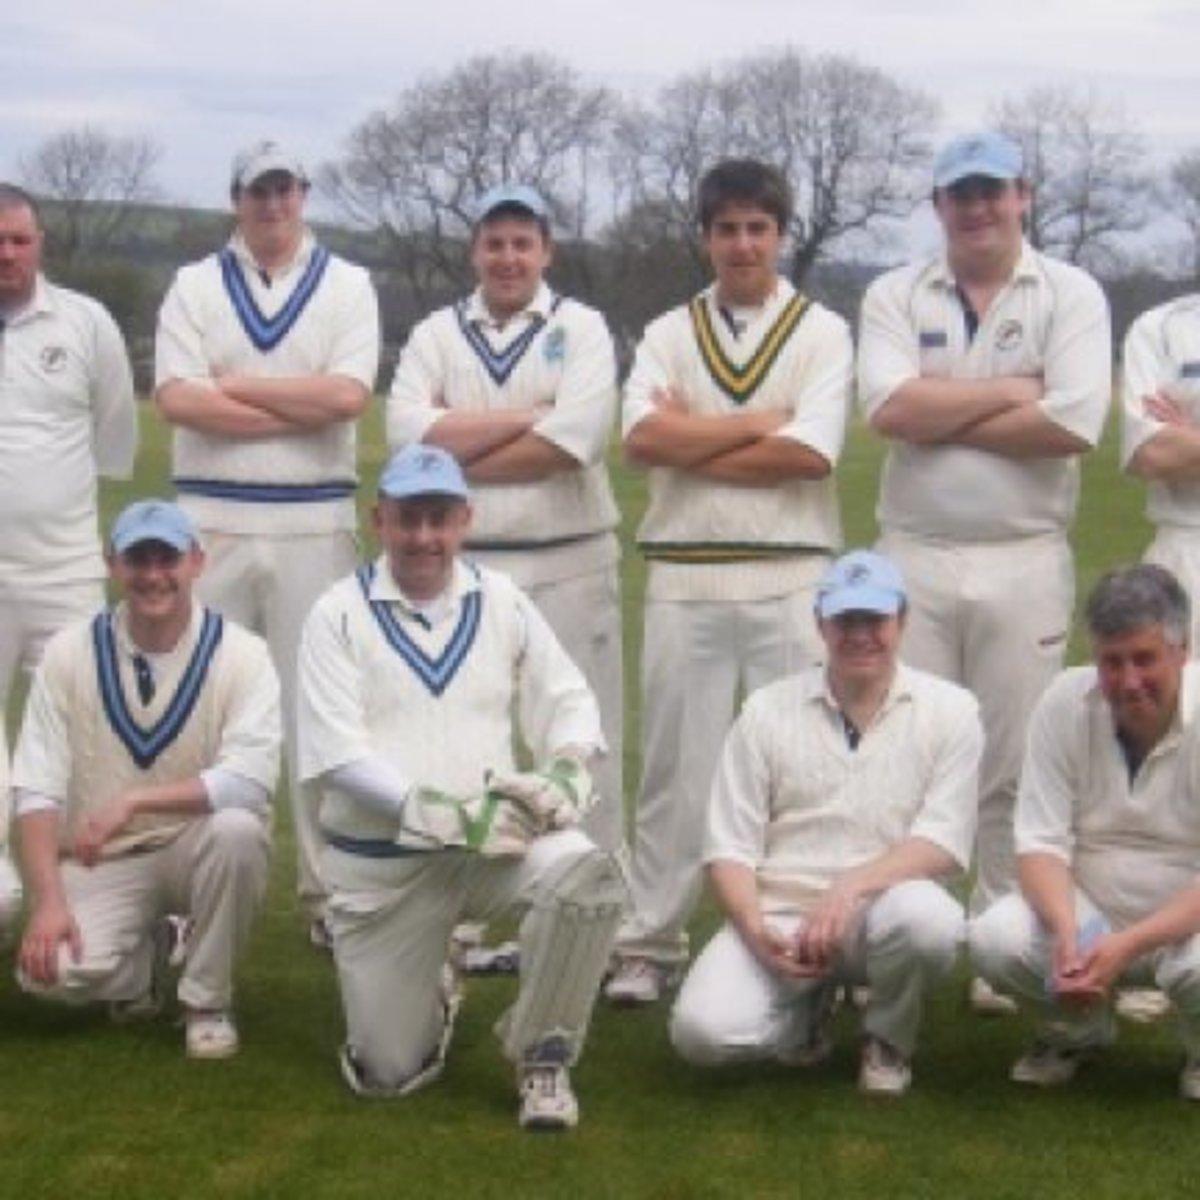 Knaresborough Forest Cricket Club - every Yorkshireman's relish